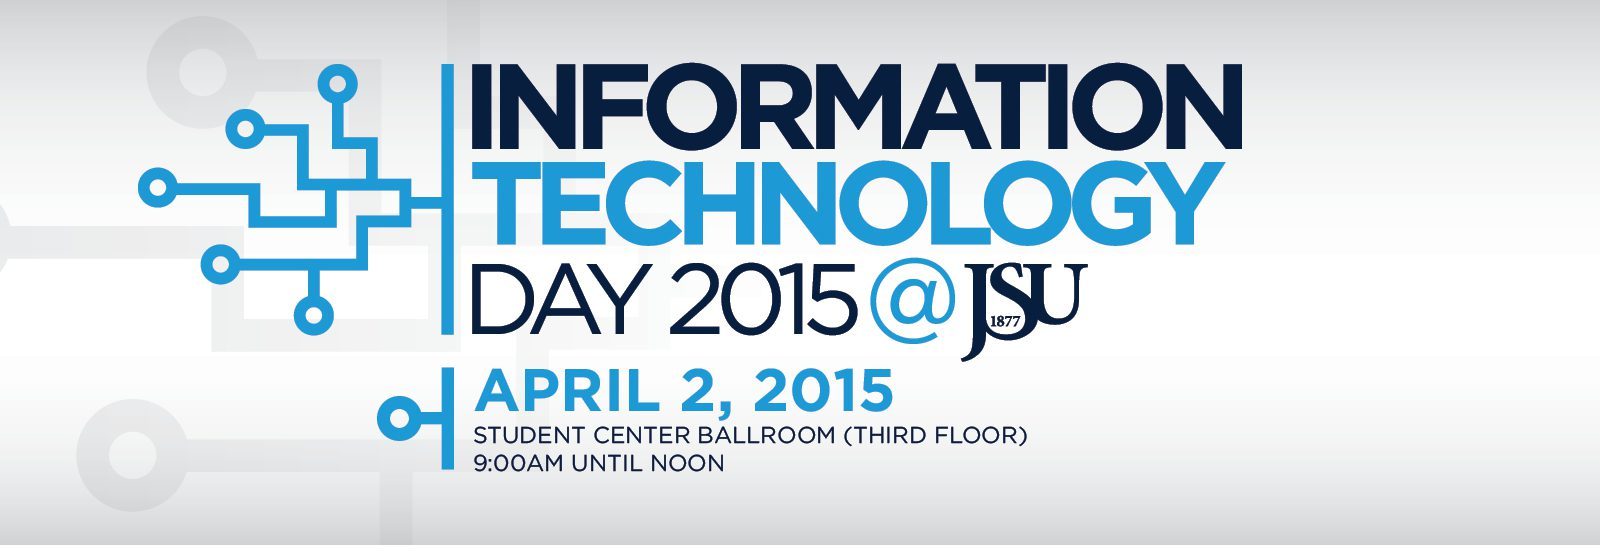 information technology homepage slider